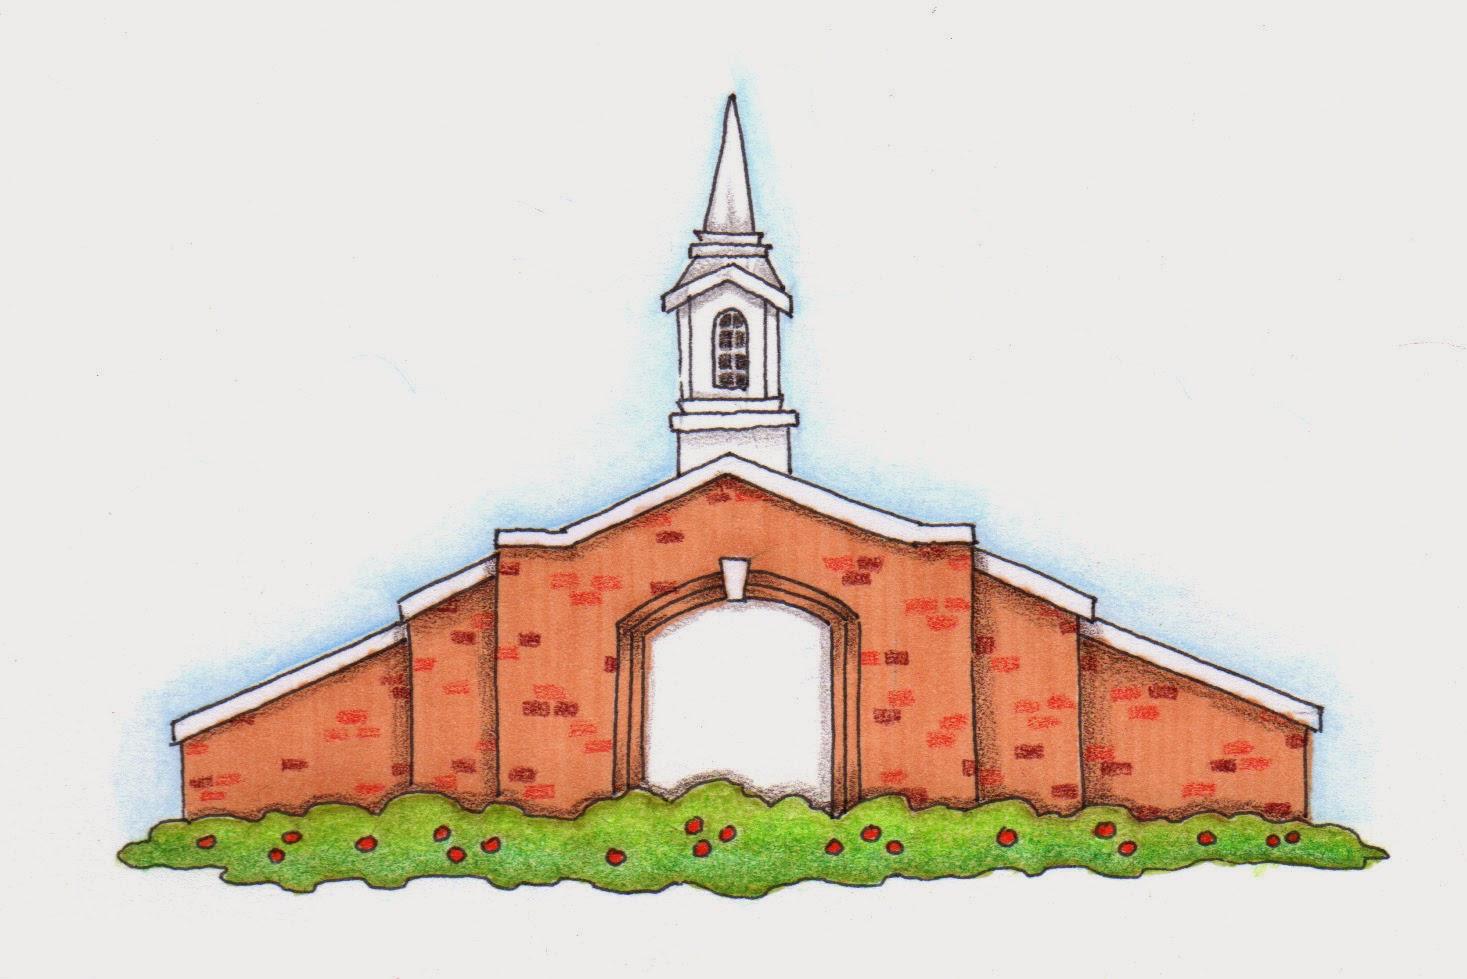 April clipart church. The barefoot chorister i